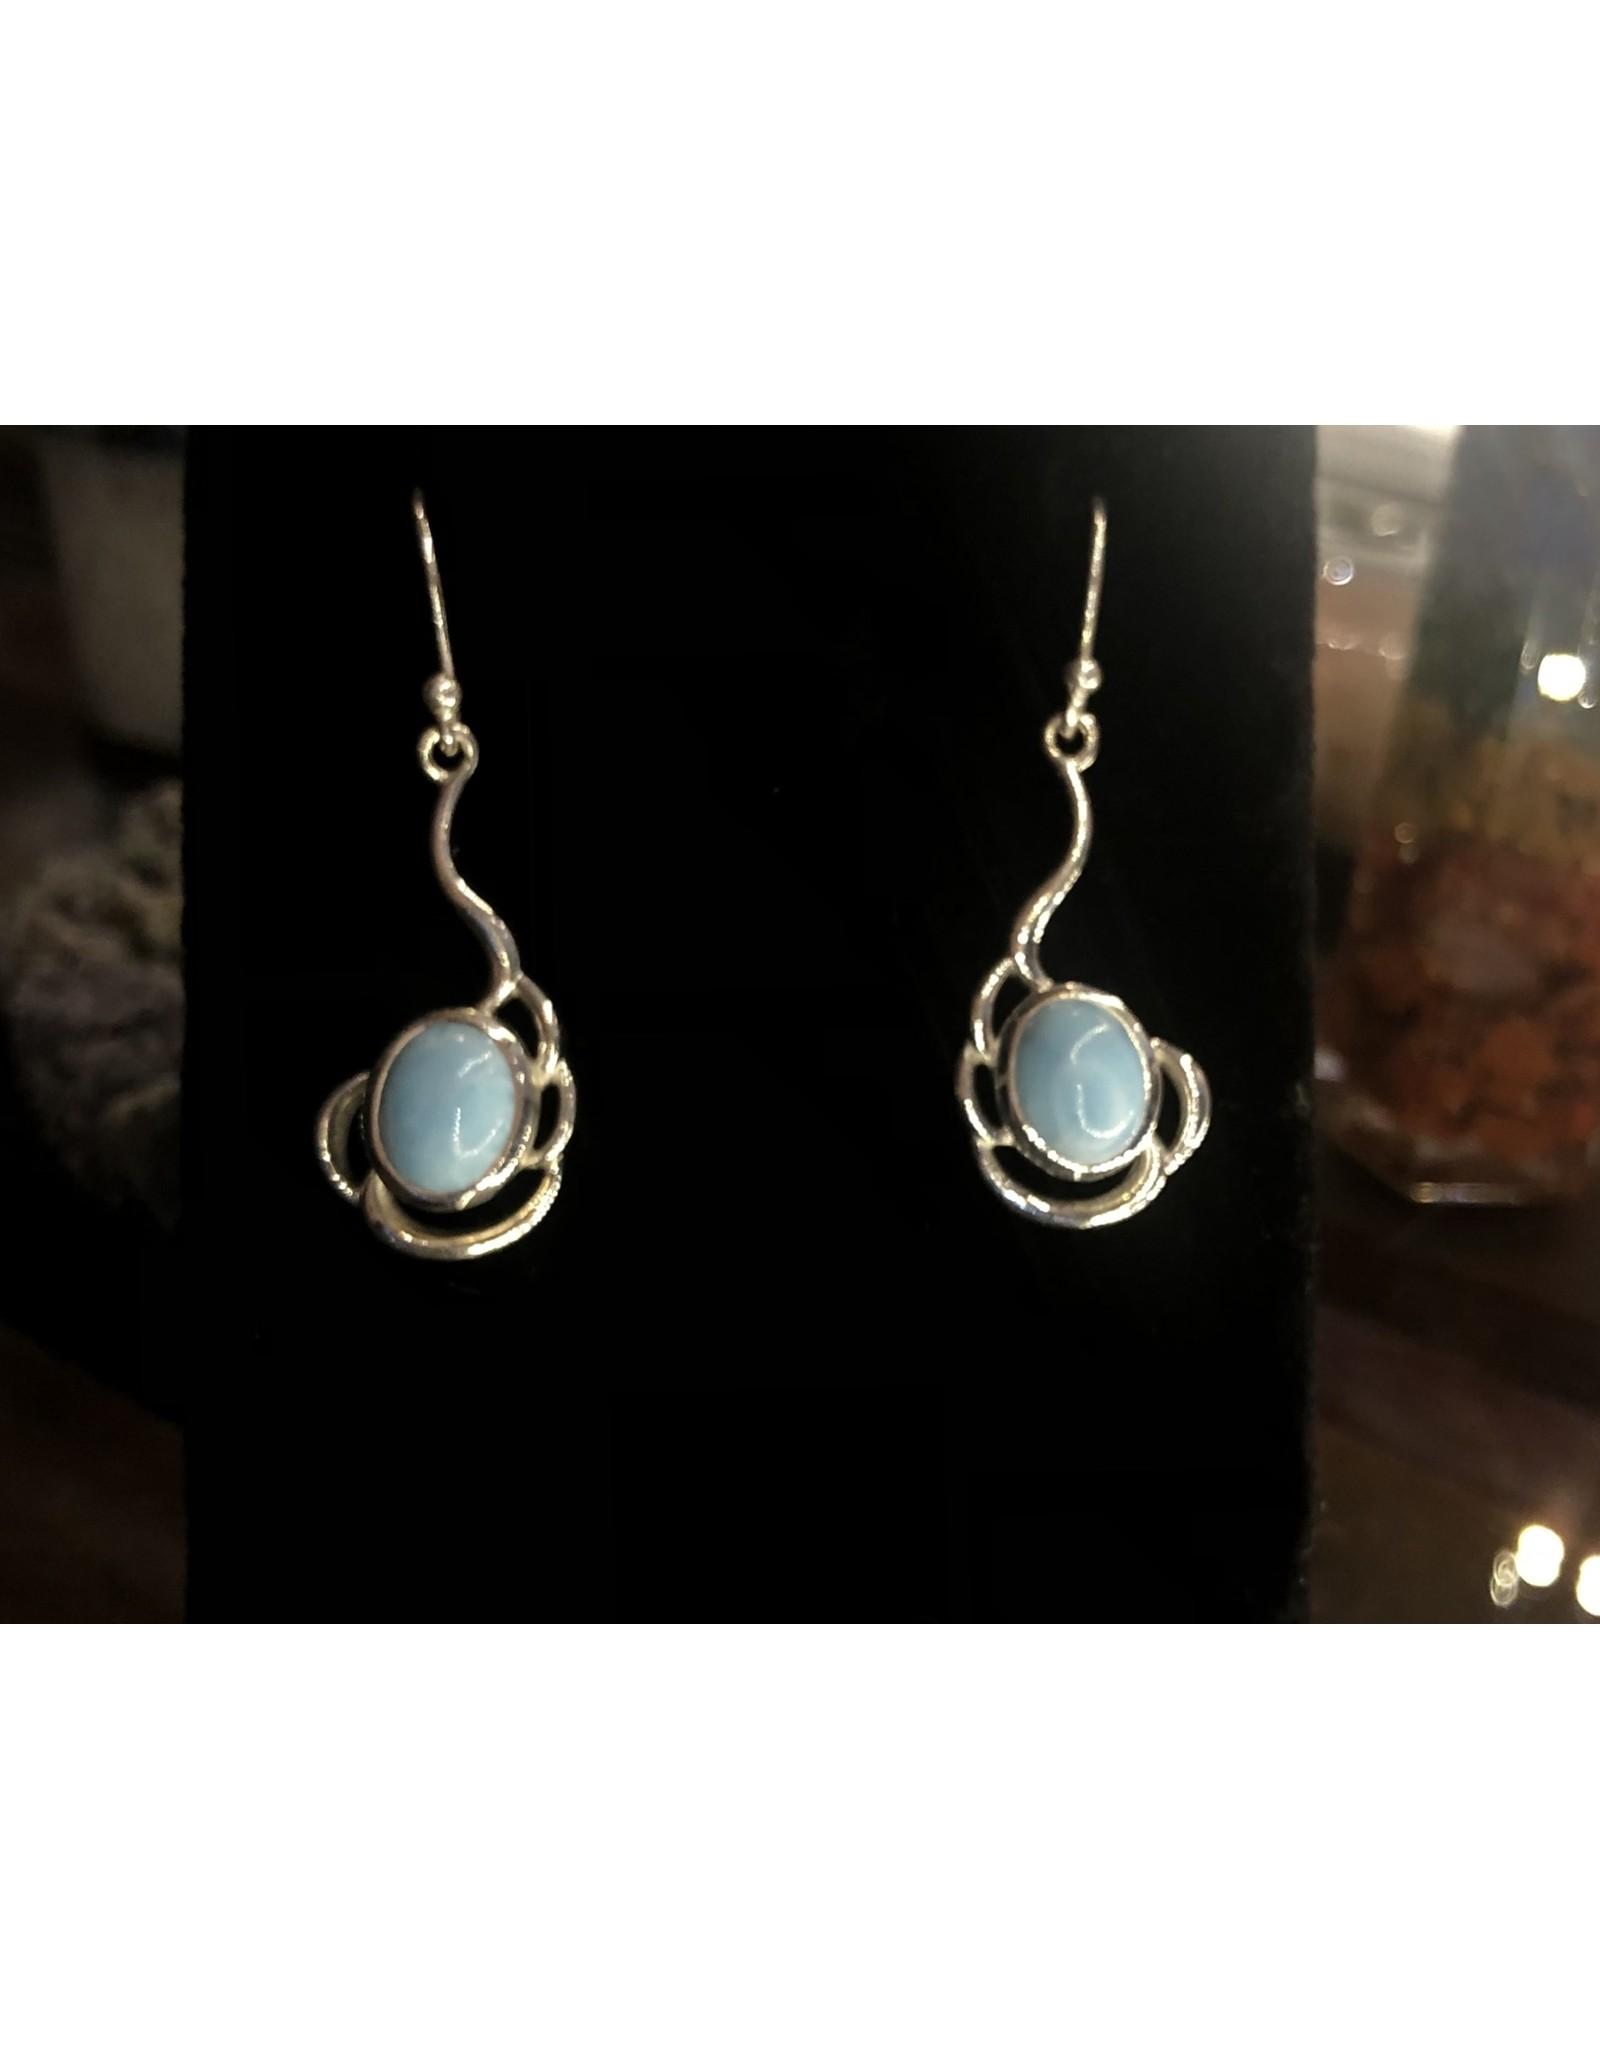 Sanchi and Filia P Designs Larimar Earrings